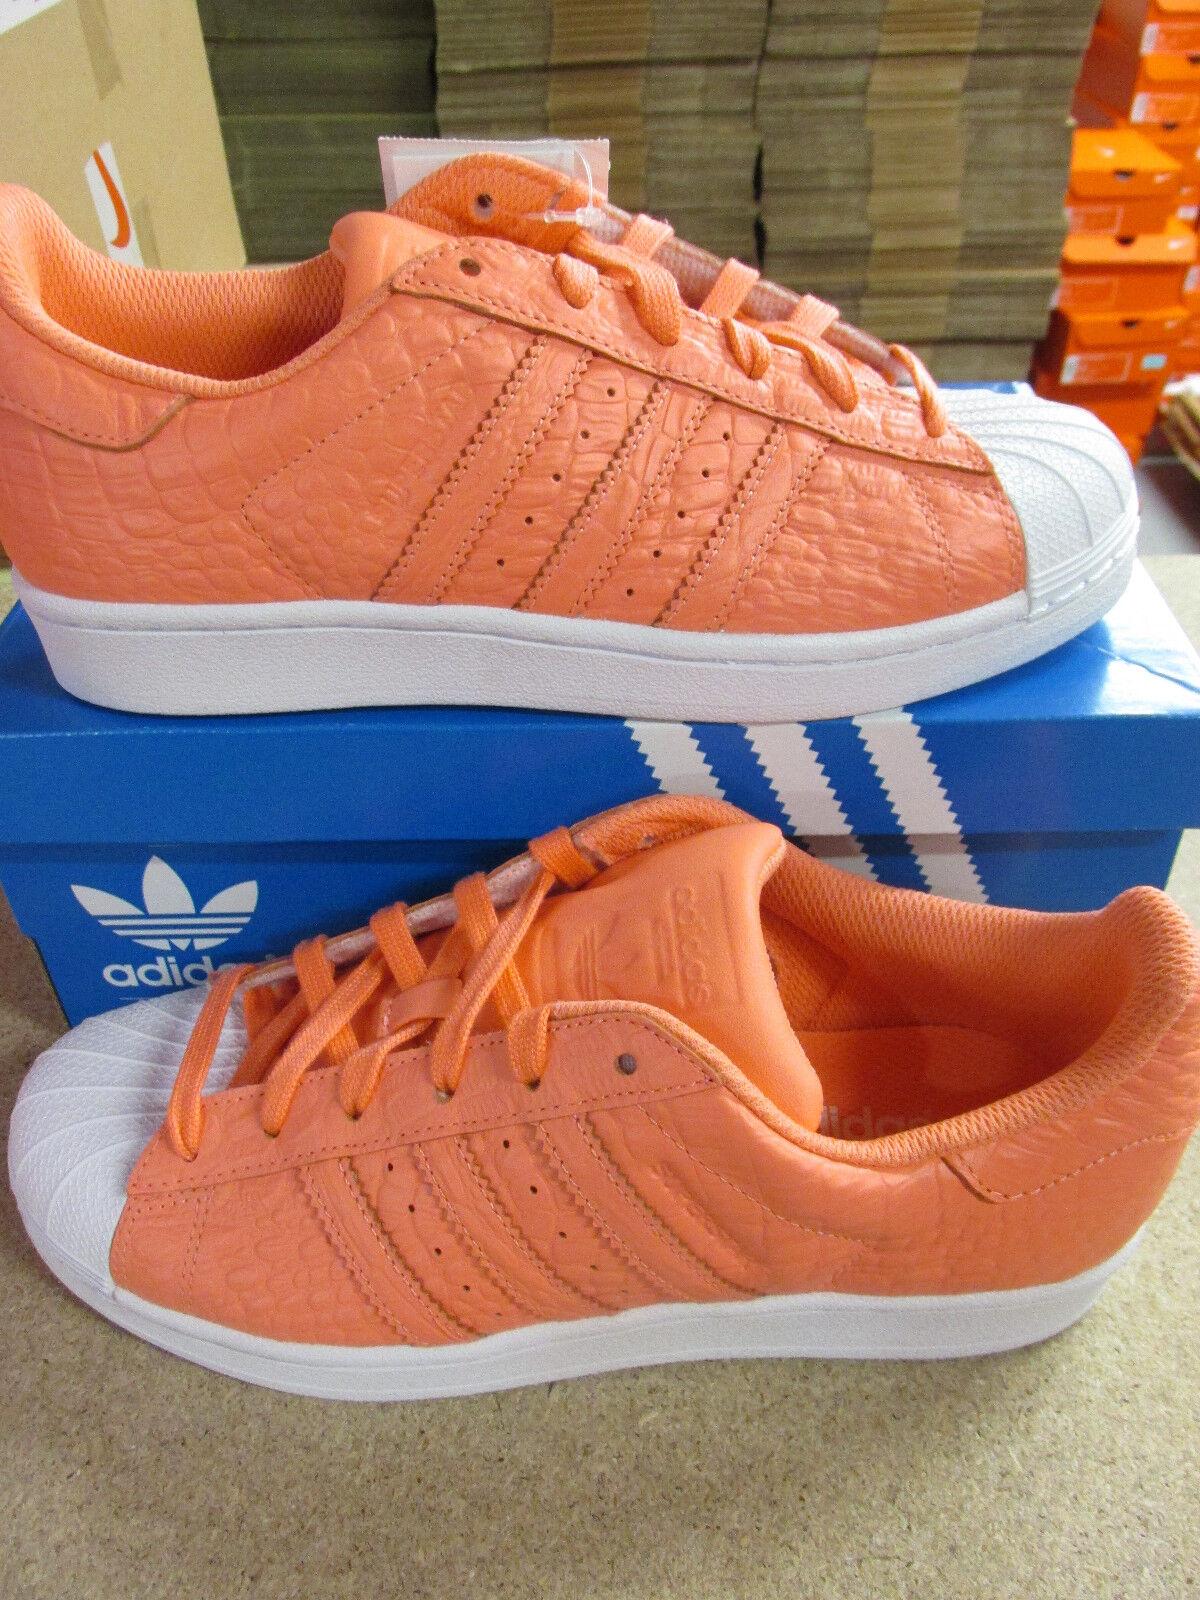 Adidas Originaux Superstar AQ2721 Baskets pour Femme Baskets